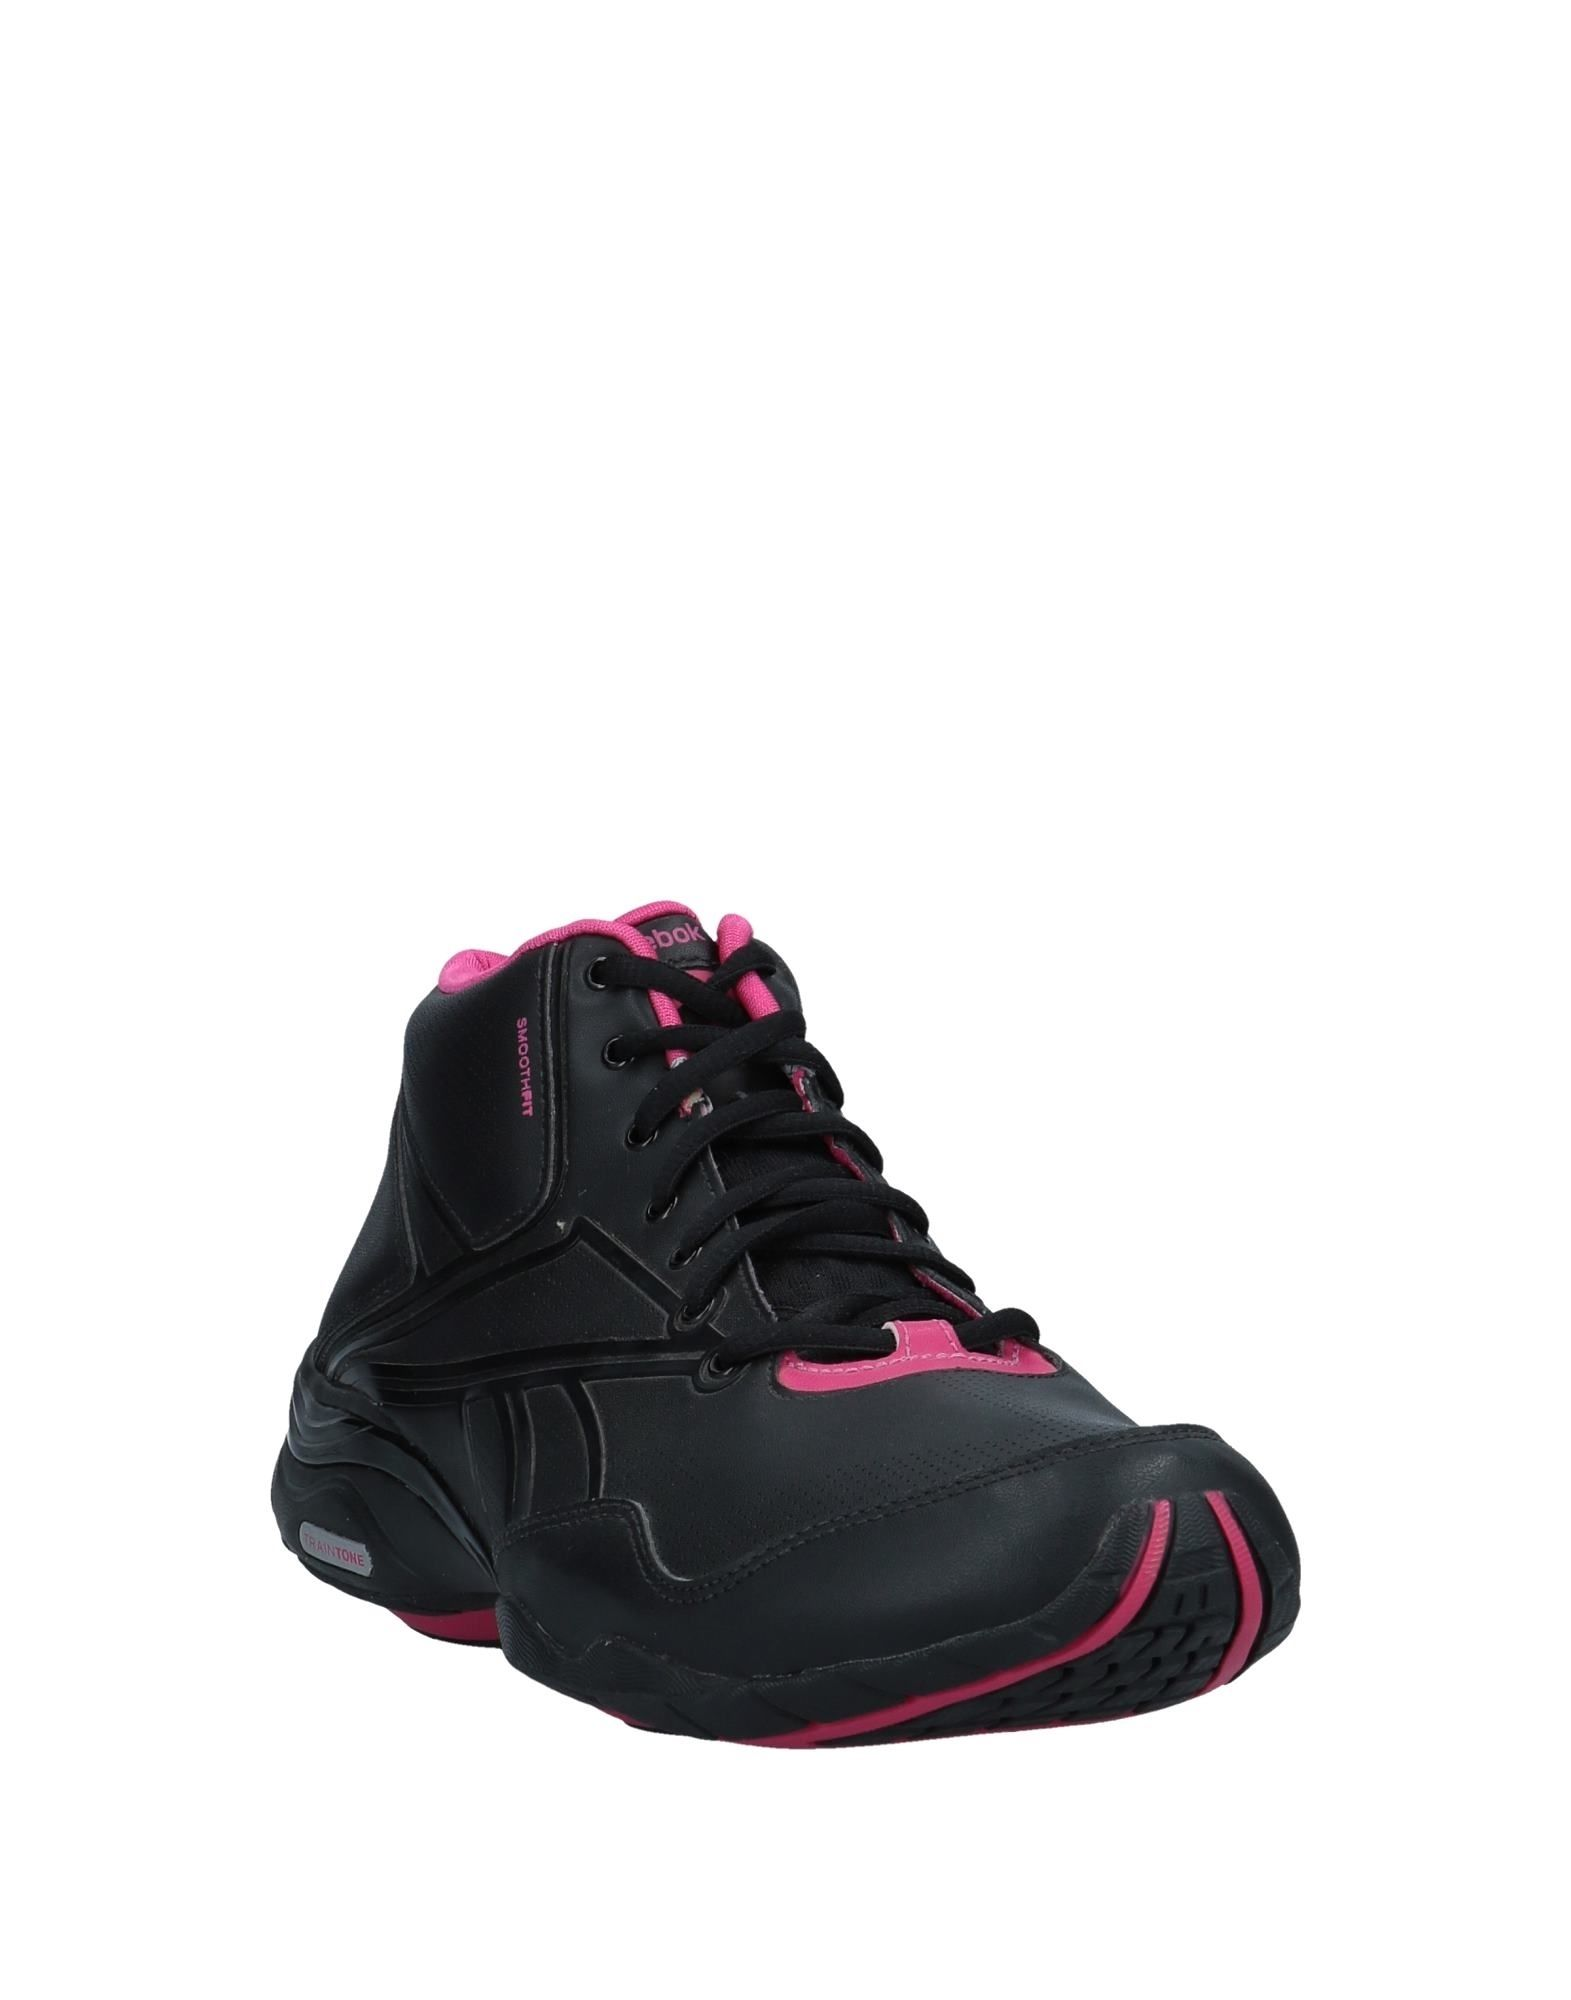 Reebok Sneakers Damen  11554157AU Gute Qualität beliebte Schuhe Schuhe Schuhe f9bc34